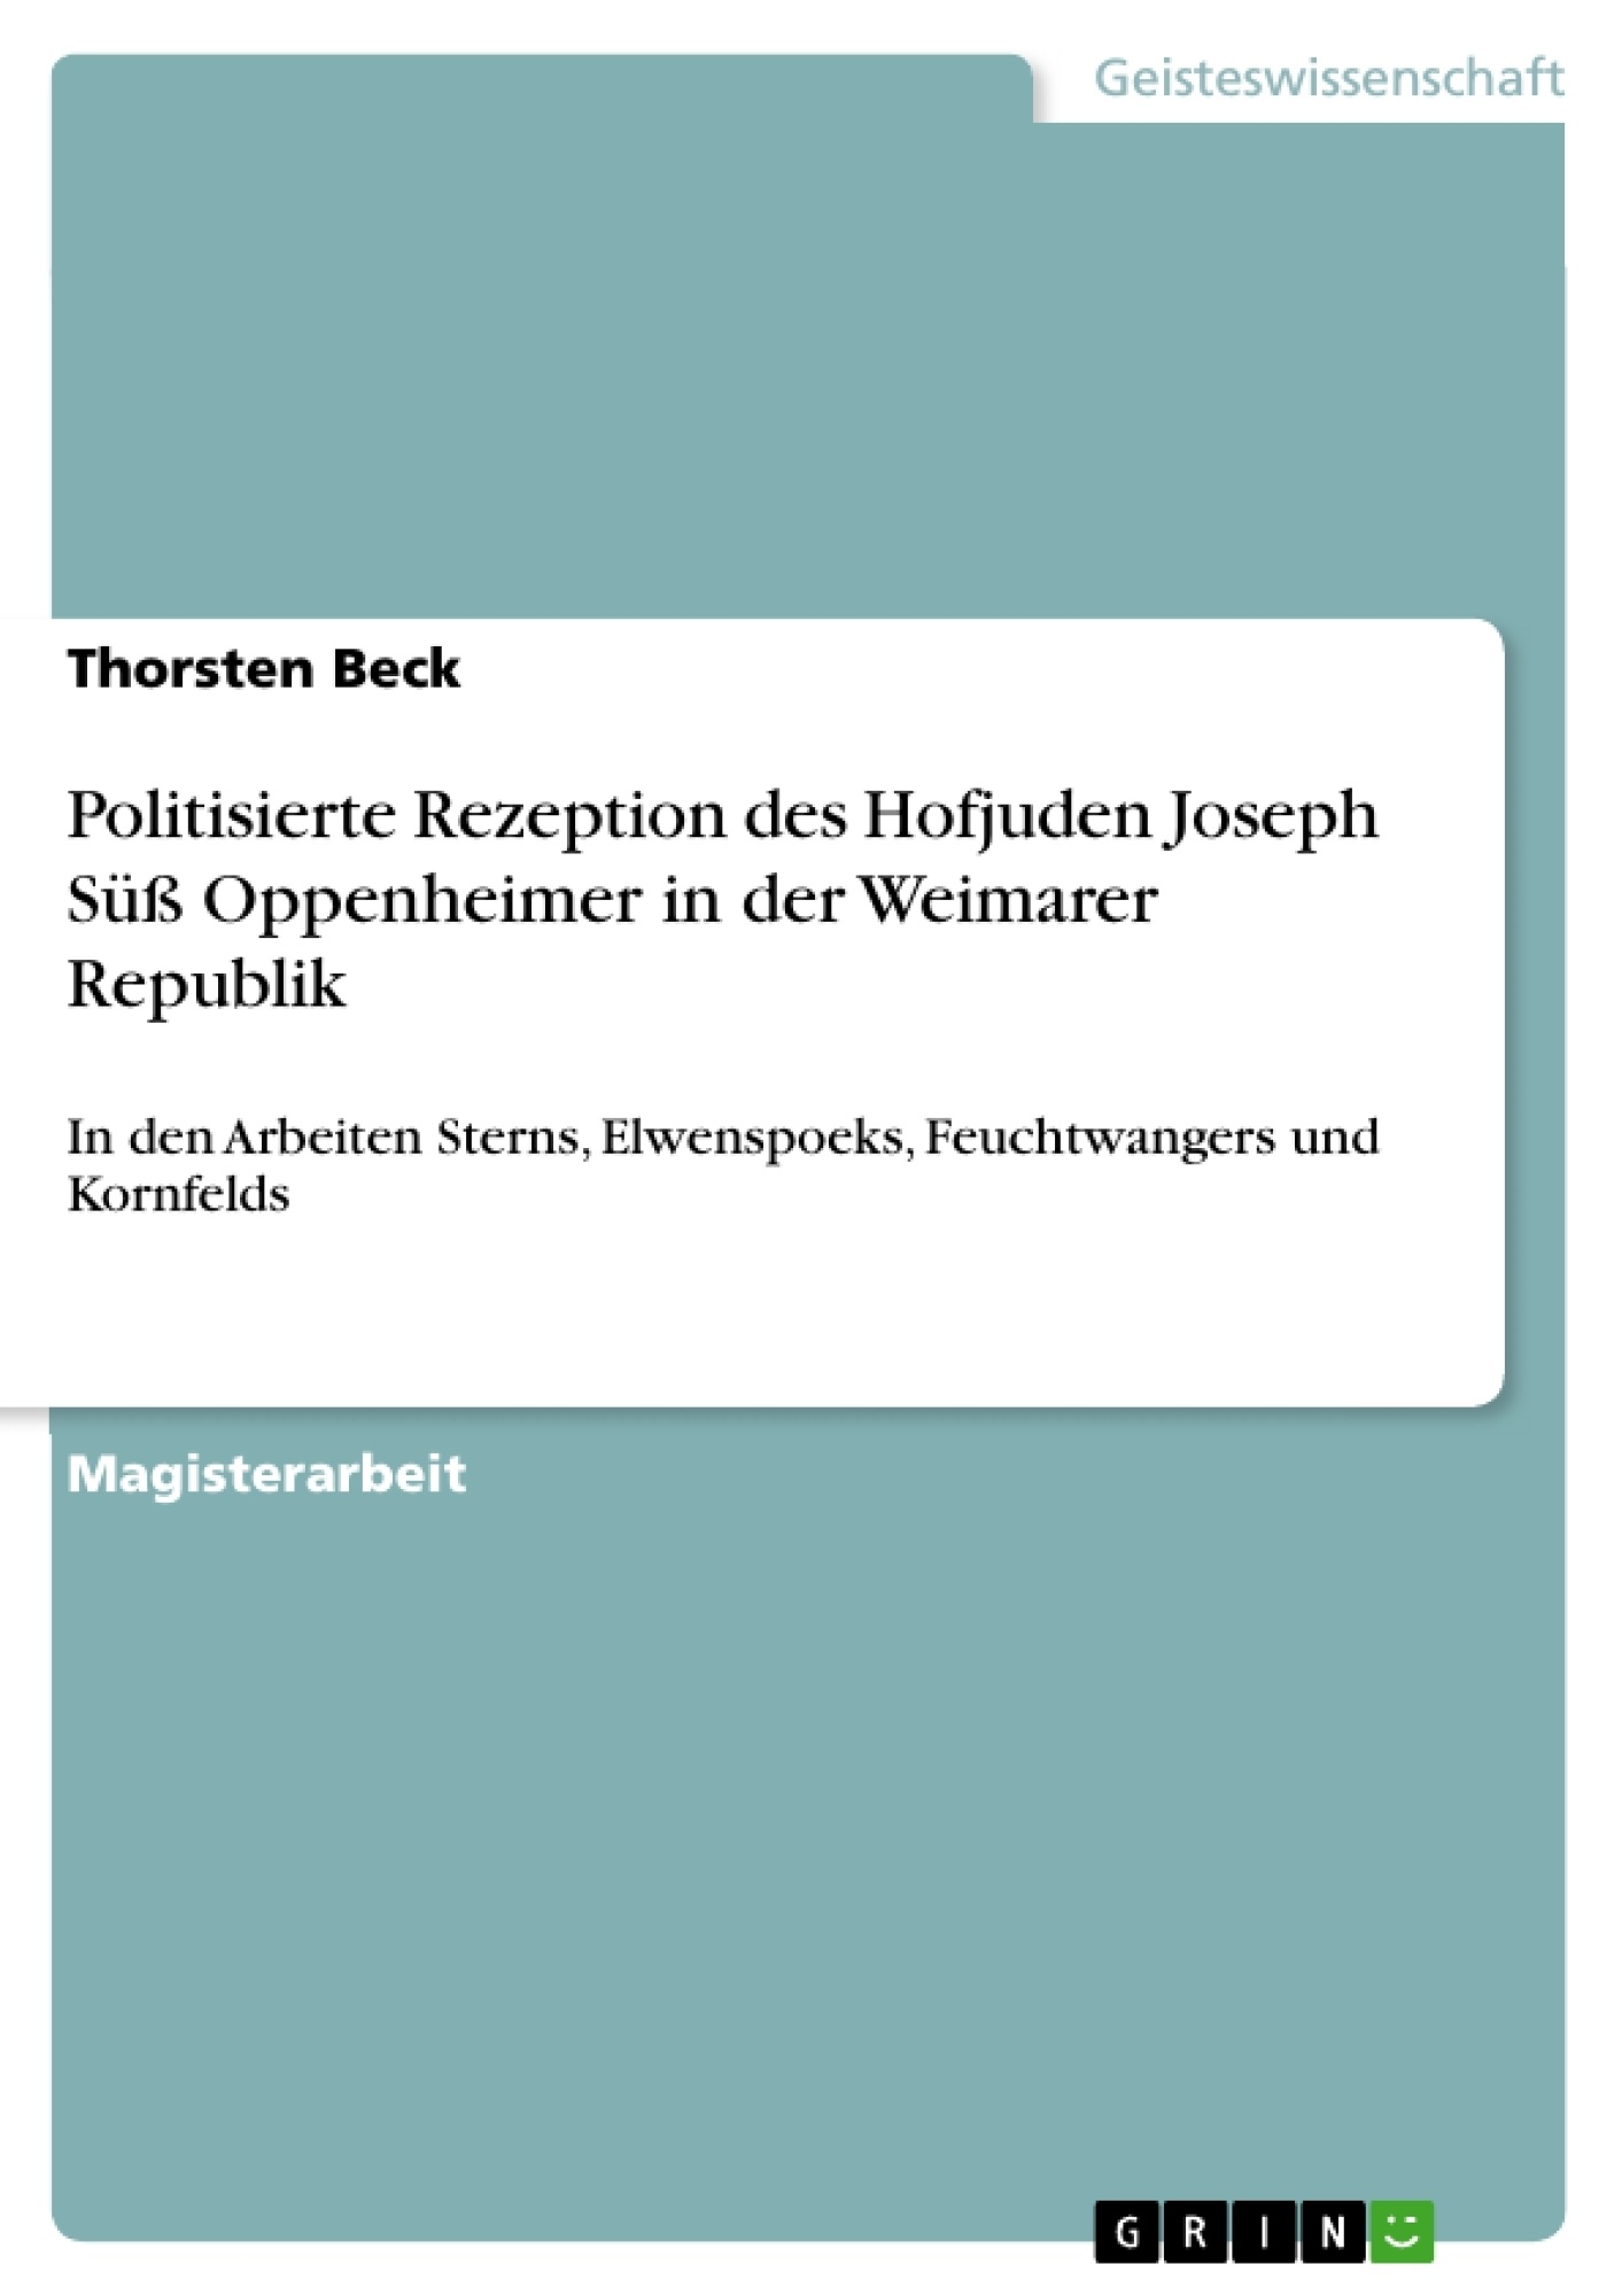 Titel: Politisierte Rezeption des Hofjuden Joseph Süß Oppenheimer in der Weimarer Republik